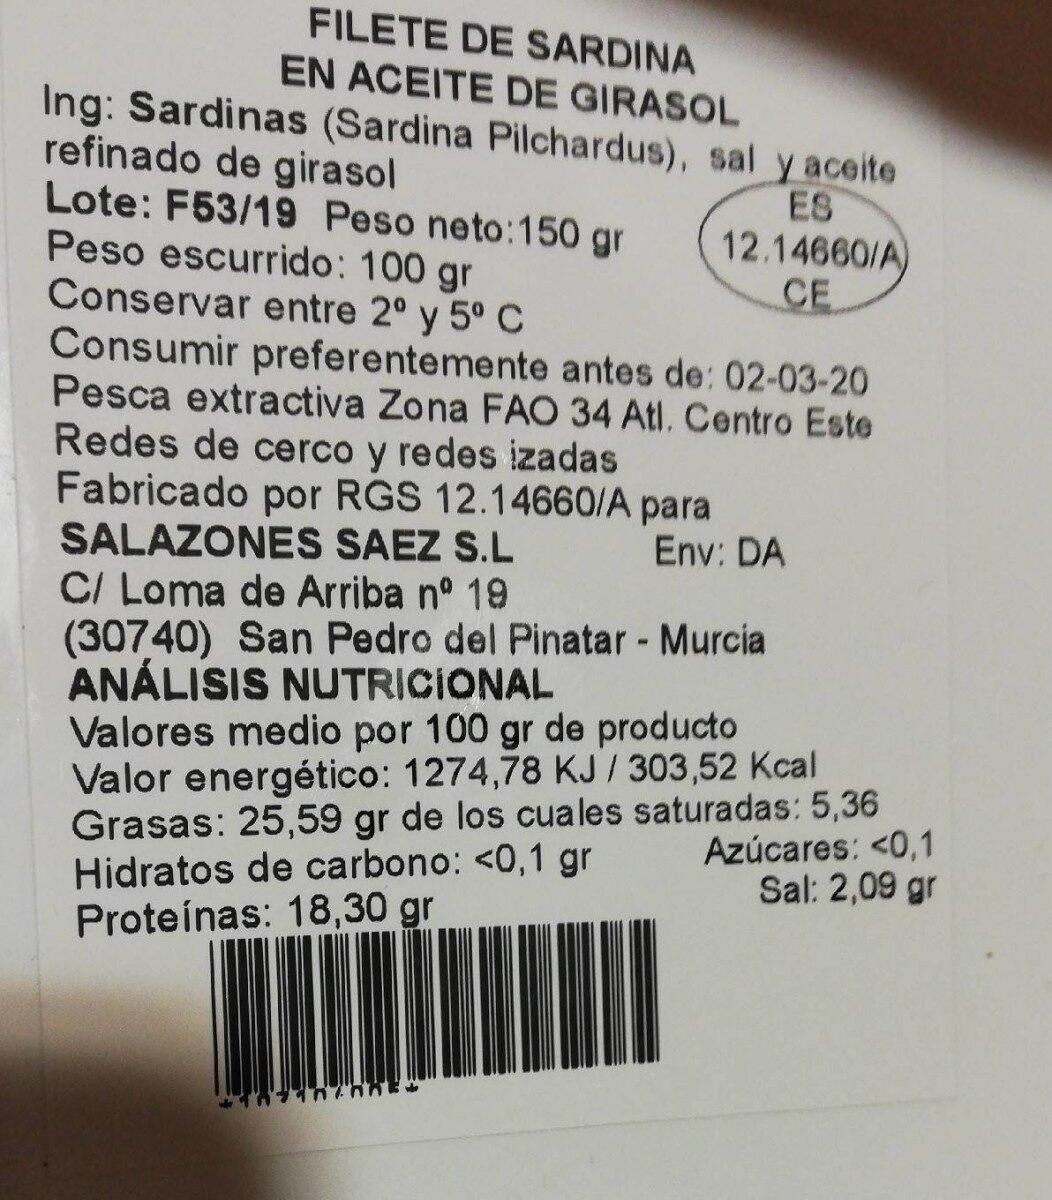 Filete de sardina en aceite de girasol - Informations nutritionnelles - es